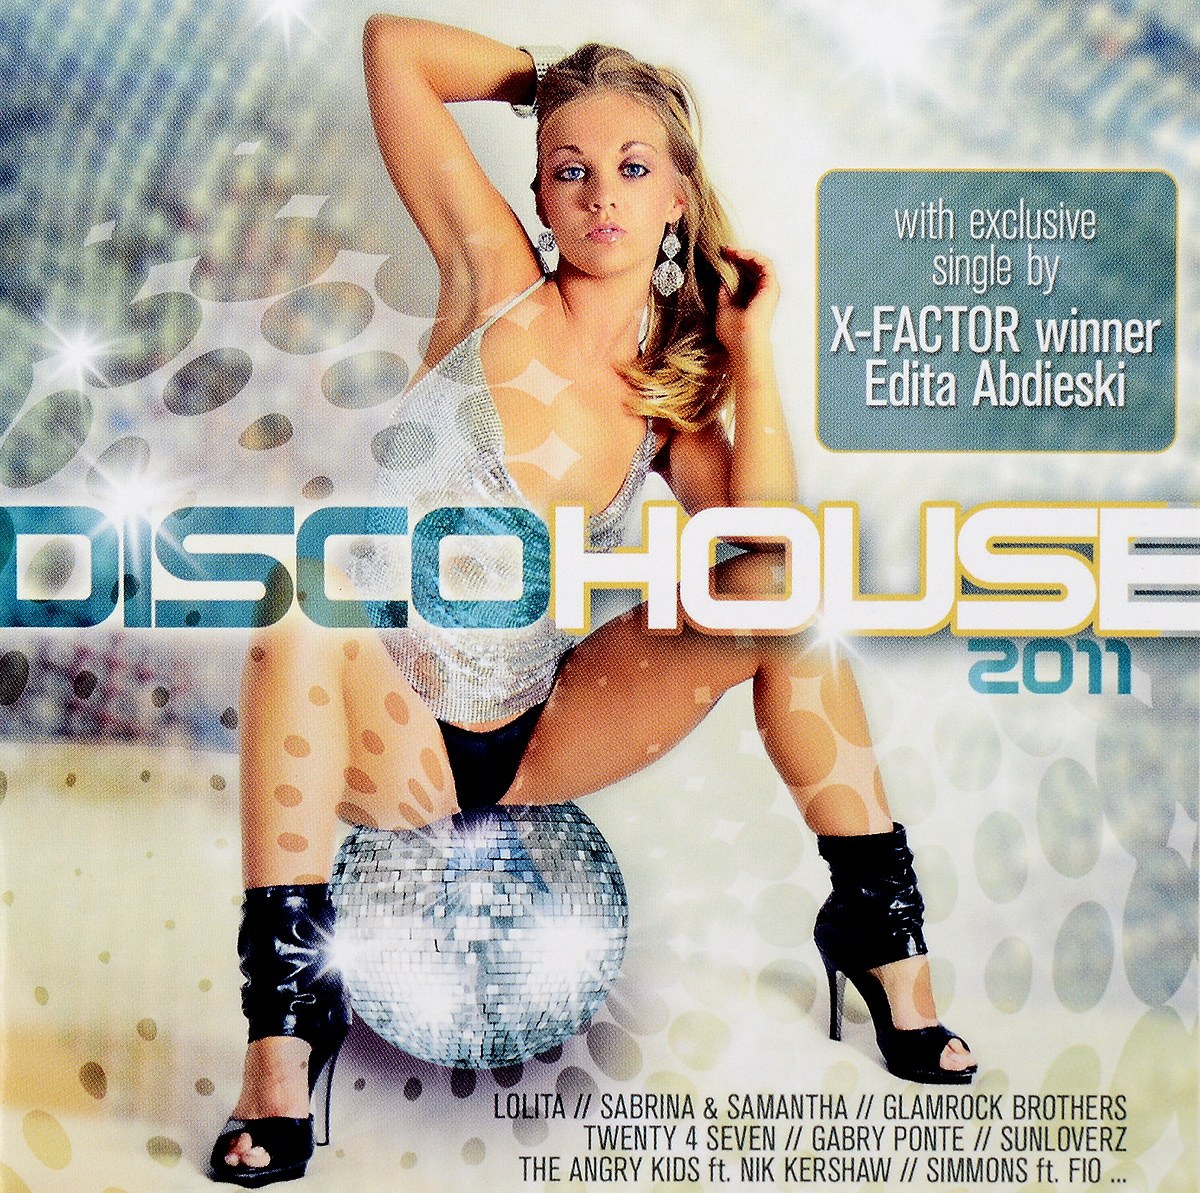 Lolita,House-Maxx,The Angry Kids,Ник Кершоу,Gabry Ponte,Кристиан Марчи,Оскар Сальжуэро,Рокфорд Крис,Gina M. Brown,Сабрина Салерно,Santiago Cortes,Manuel Baccano,Disco Deejays,Discotronix,Richtberg & Wojkowski,Sunloverz,Skreatch,Крис Галмон,Pronto,Eiffel 65 Disco House 2011 (2 CD) deutscher disco fox 2011 2 cd